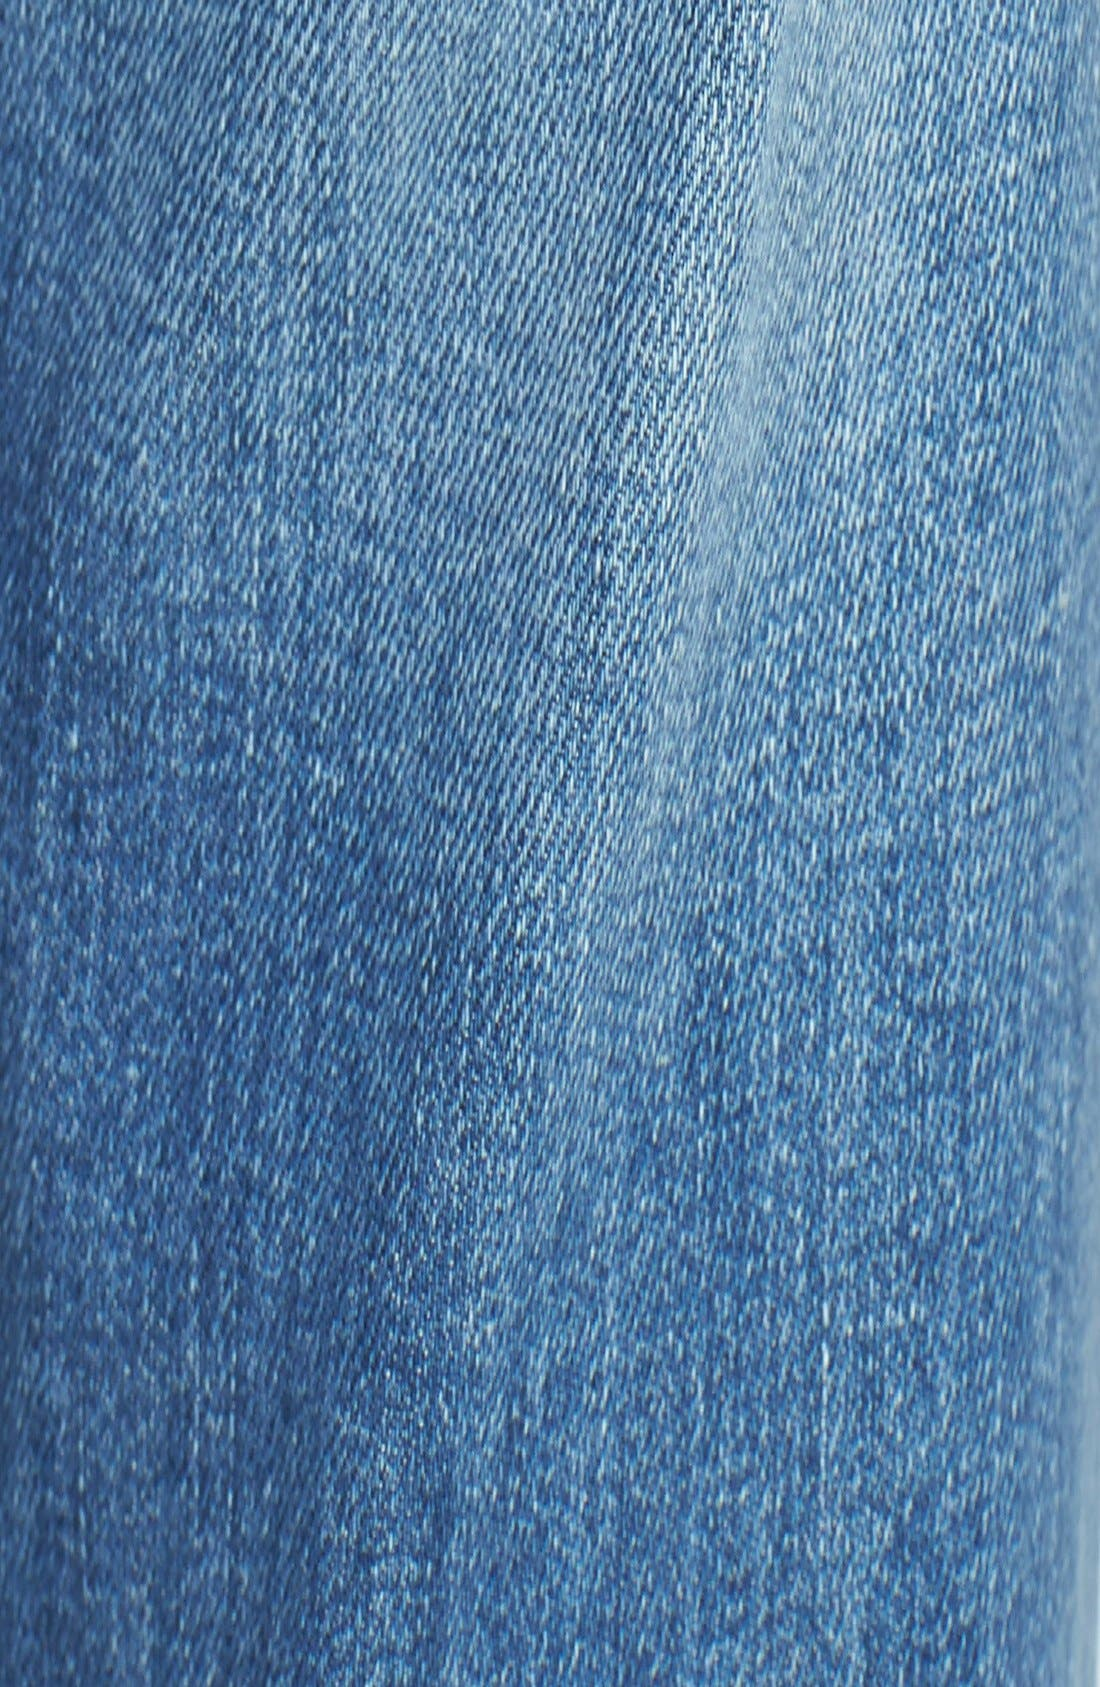 Denim 'Jimmy Jimmy' Boyfriend Skinny Jeans,                             Alternate thumbnail 2, color,                             450